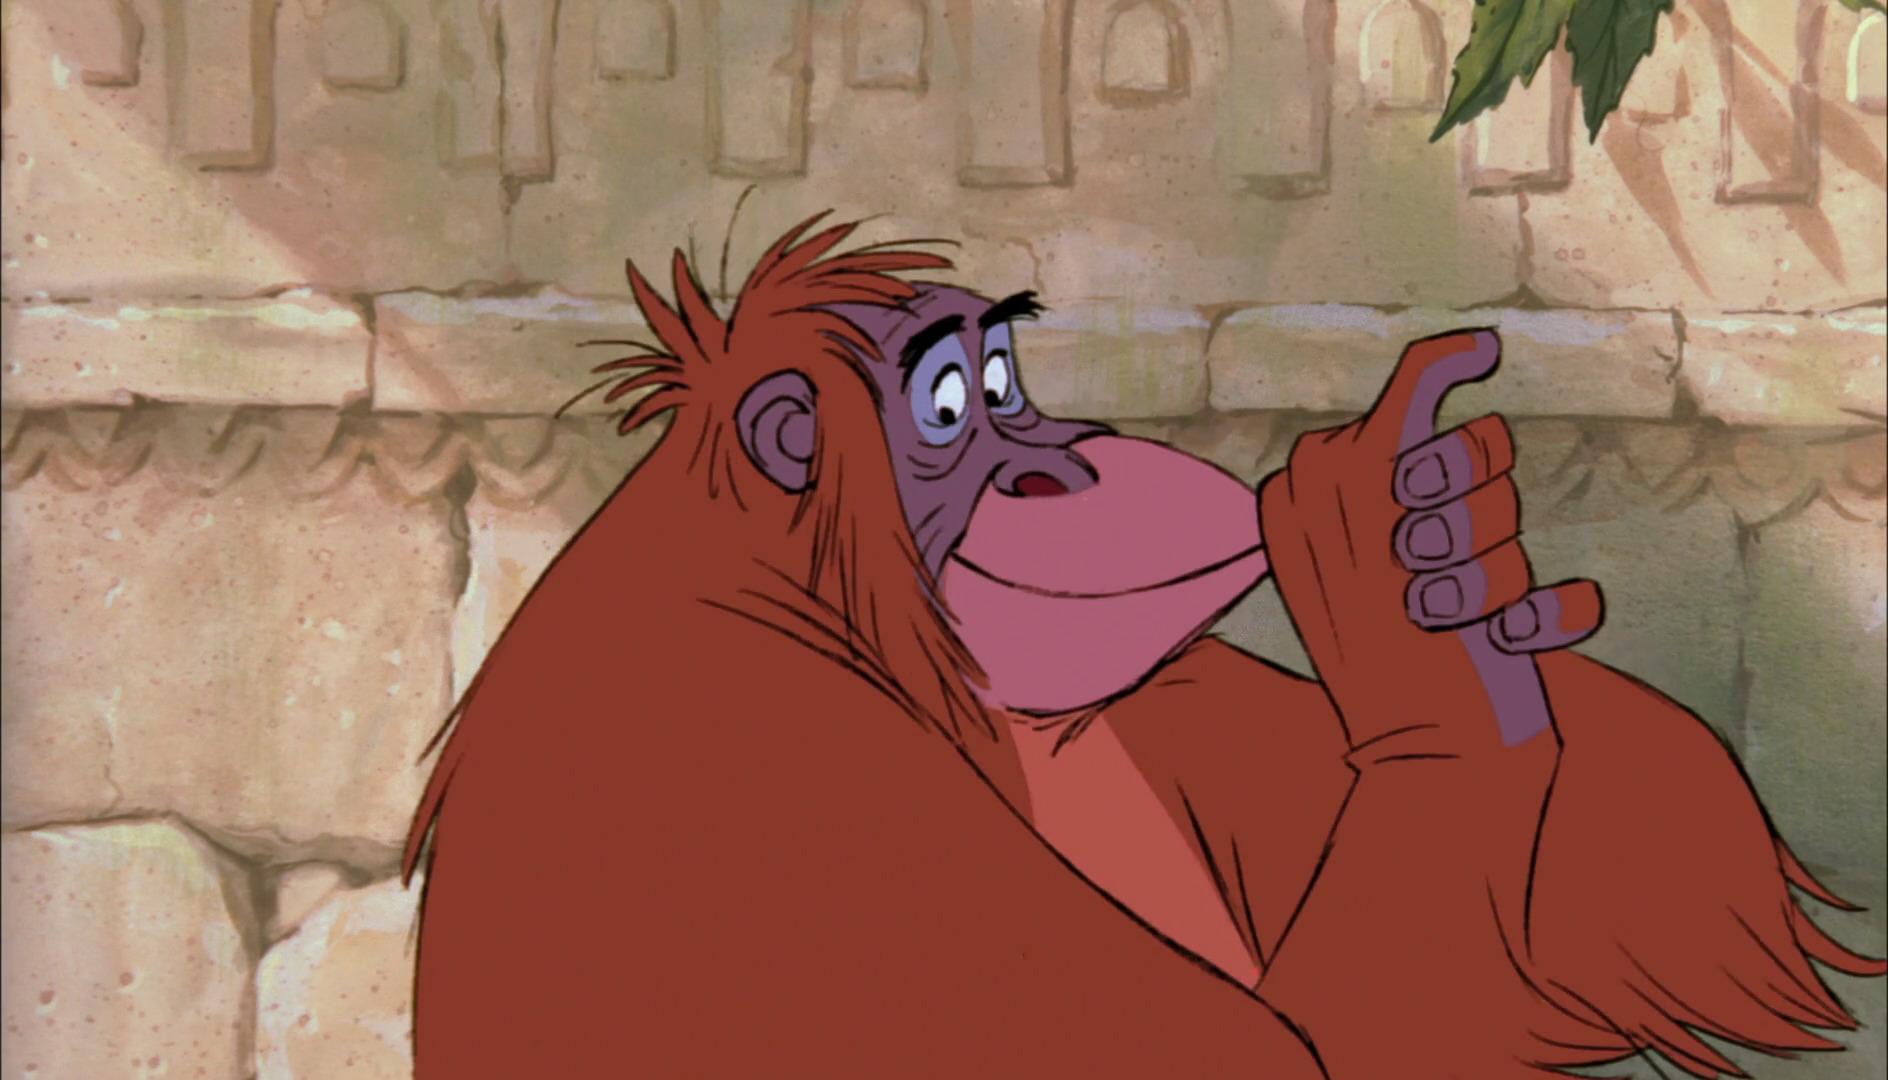 roi louie king personnage livre jungle book disney character